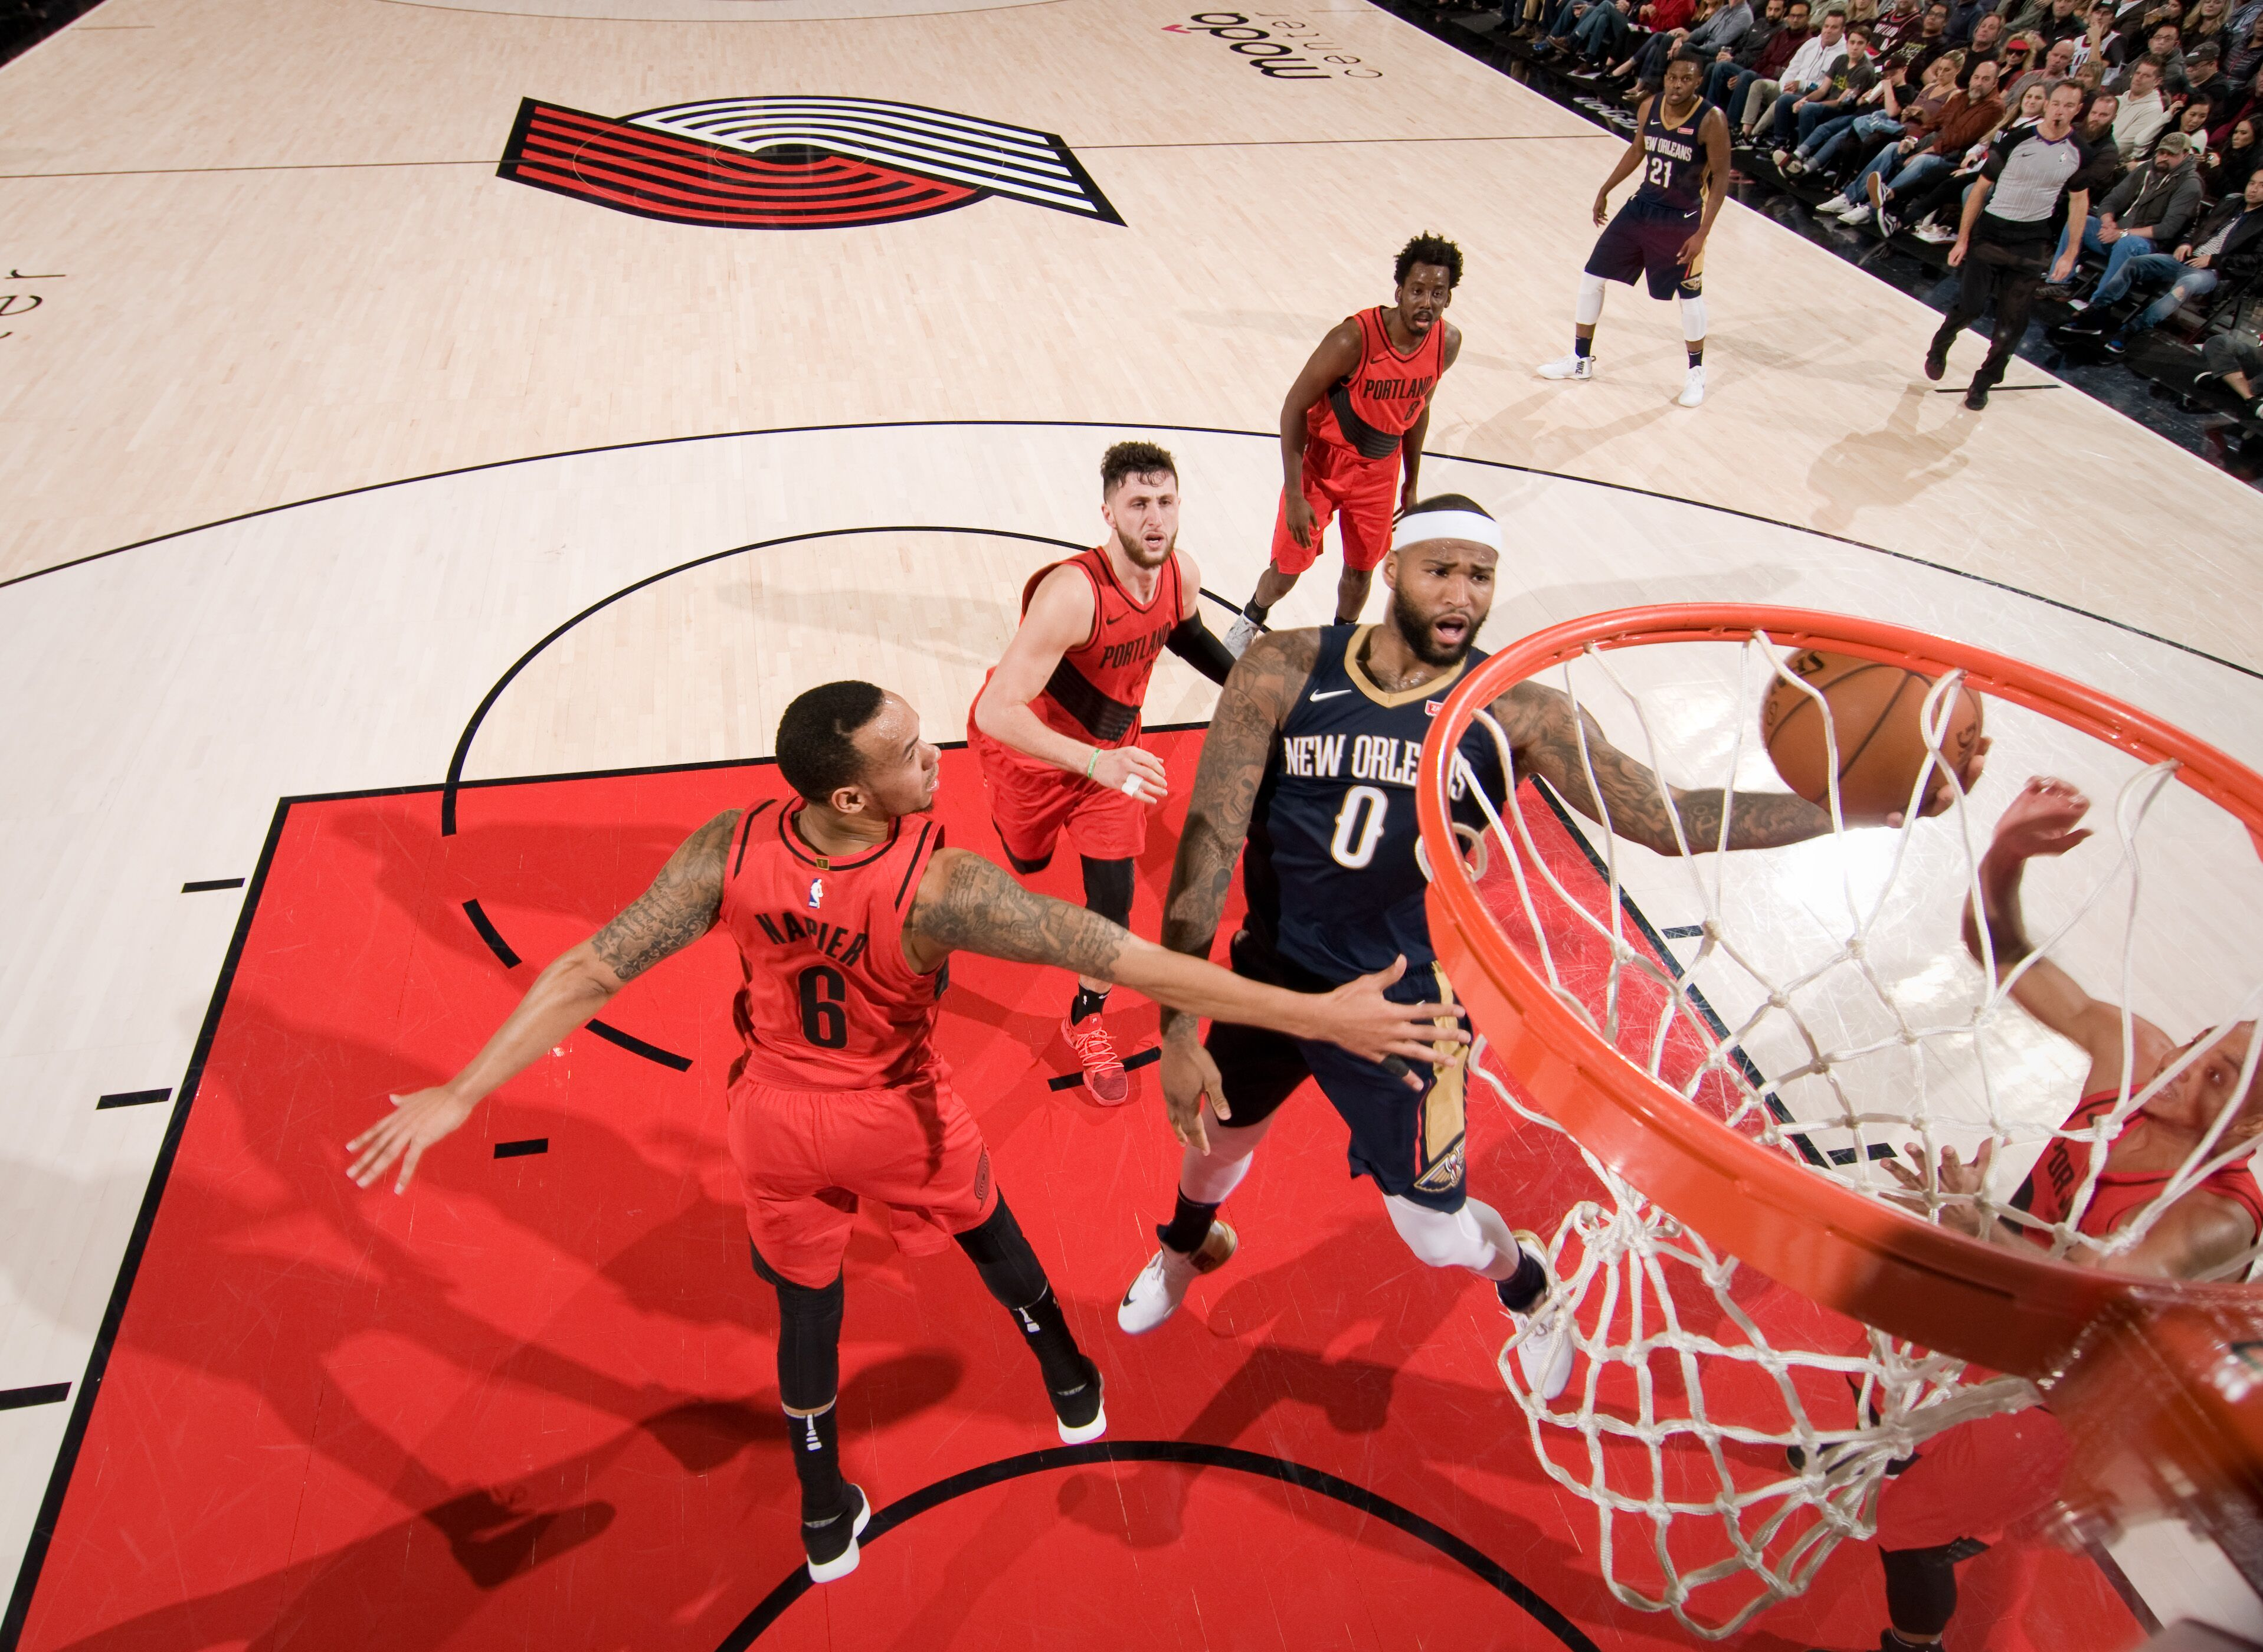 Pelicans Vs Trail Blazers Detail: Pelicans Big Three Dominate, Beat Blazers 119-113